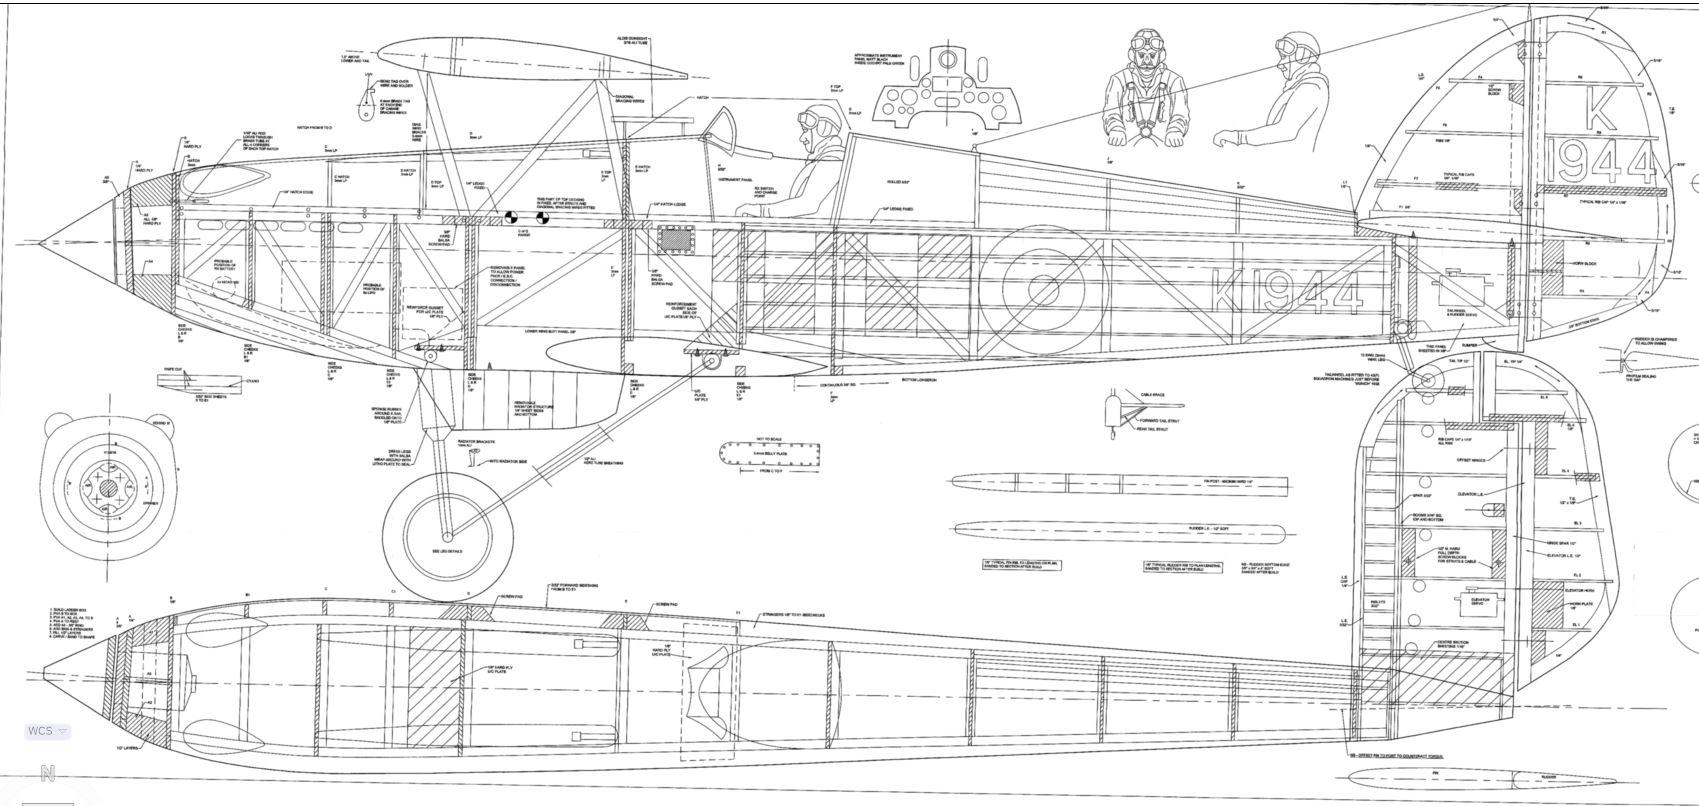 U Haul Flat Rate | Wiring Diagram Database Uhaul Trailer Ke Controller Wiring Diagram on 2003 chevy trailblazer trailer plug diagram, gm 7-way wiring diagram, u-haul light wiring diagram, jr xp9303 module pin diagram, uhaul trailer dimensions, evaporative cooler wiring diagram, u-haul brake controller diagram, 4 1 haul system diagram, u-haul trailer light wire diagram, bargman cord wiring diagram, 200 jeep grand cherokee fuse diagram, uhaul trailer plug diagram, trail duty wiring diagram, uhaul trailer hitch diagram, 1993 jeep grand cherokee fuse box diagram, camper wiring diagram,